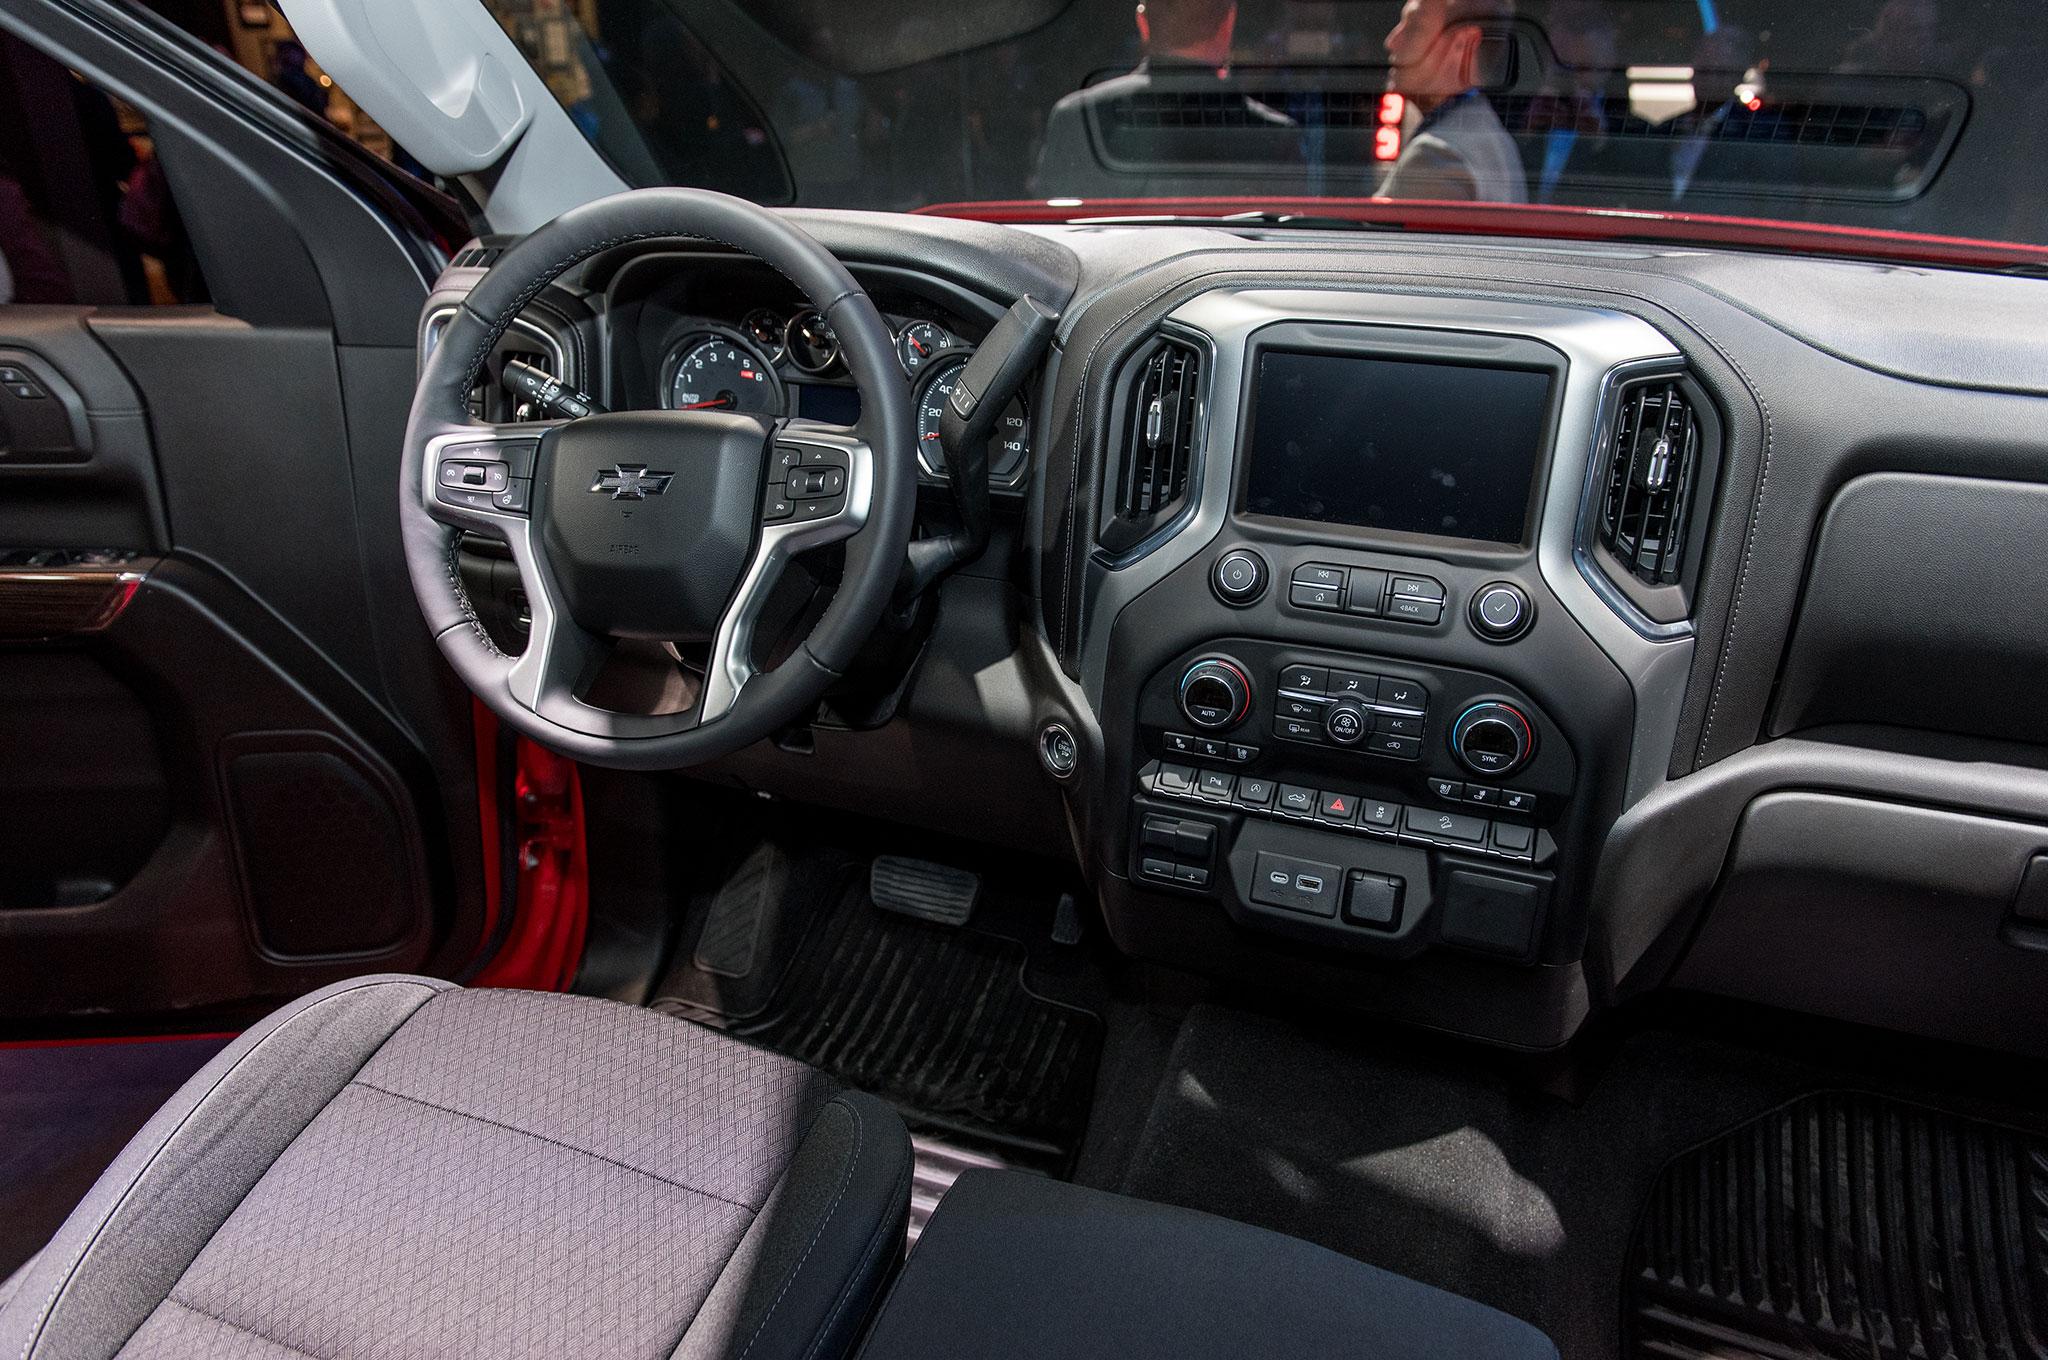 Lifted Truck Iphone Wallpaper Silveradosierra Com Gmc Sierra 2018 Vs 2019 Ecotec3 5